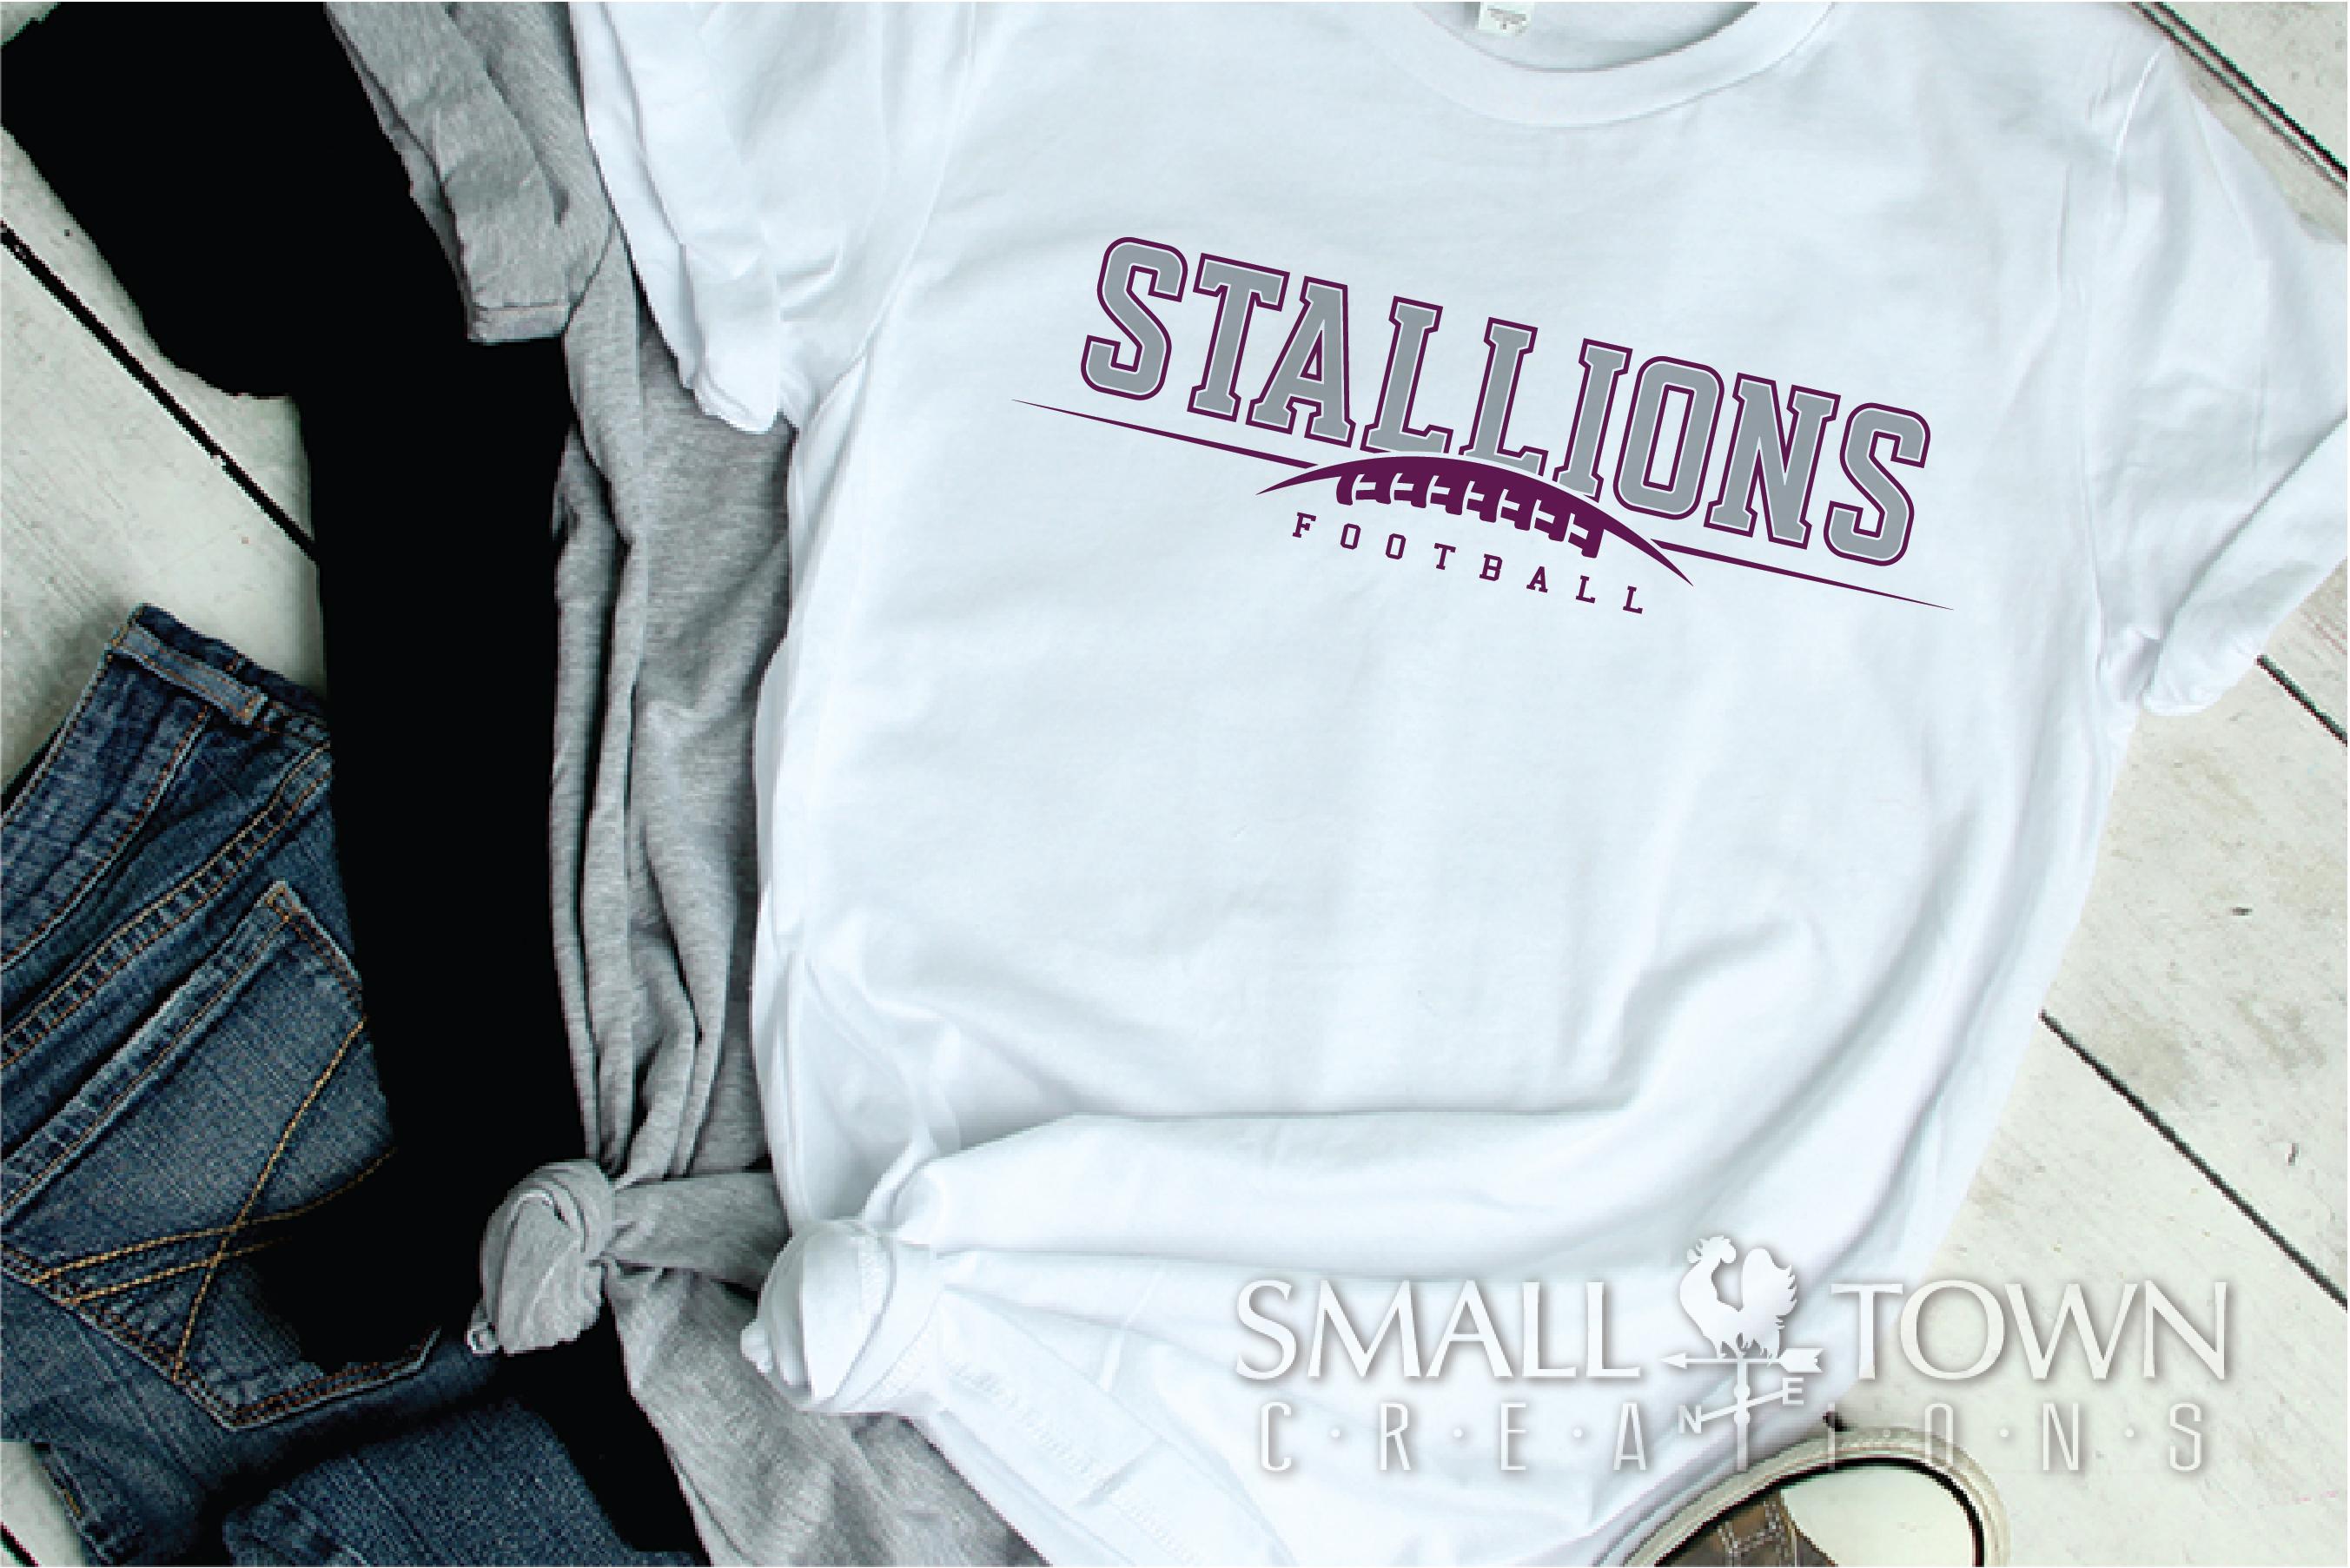 Stallions Football Team, Team, Sport, PRINT, CUT & DESIGN example image 2